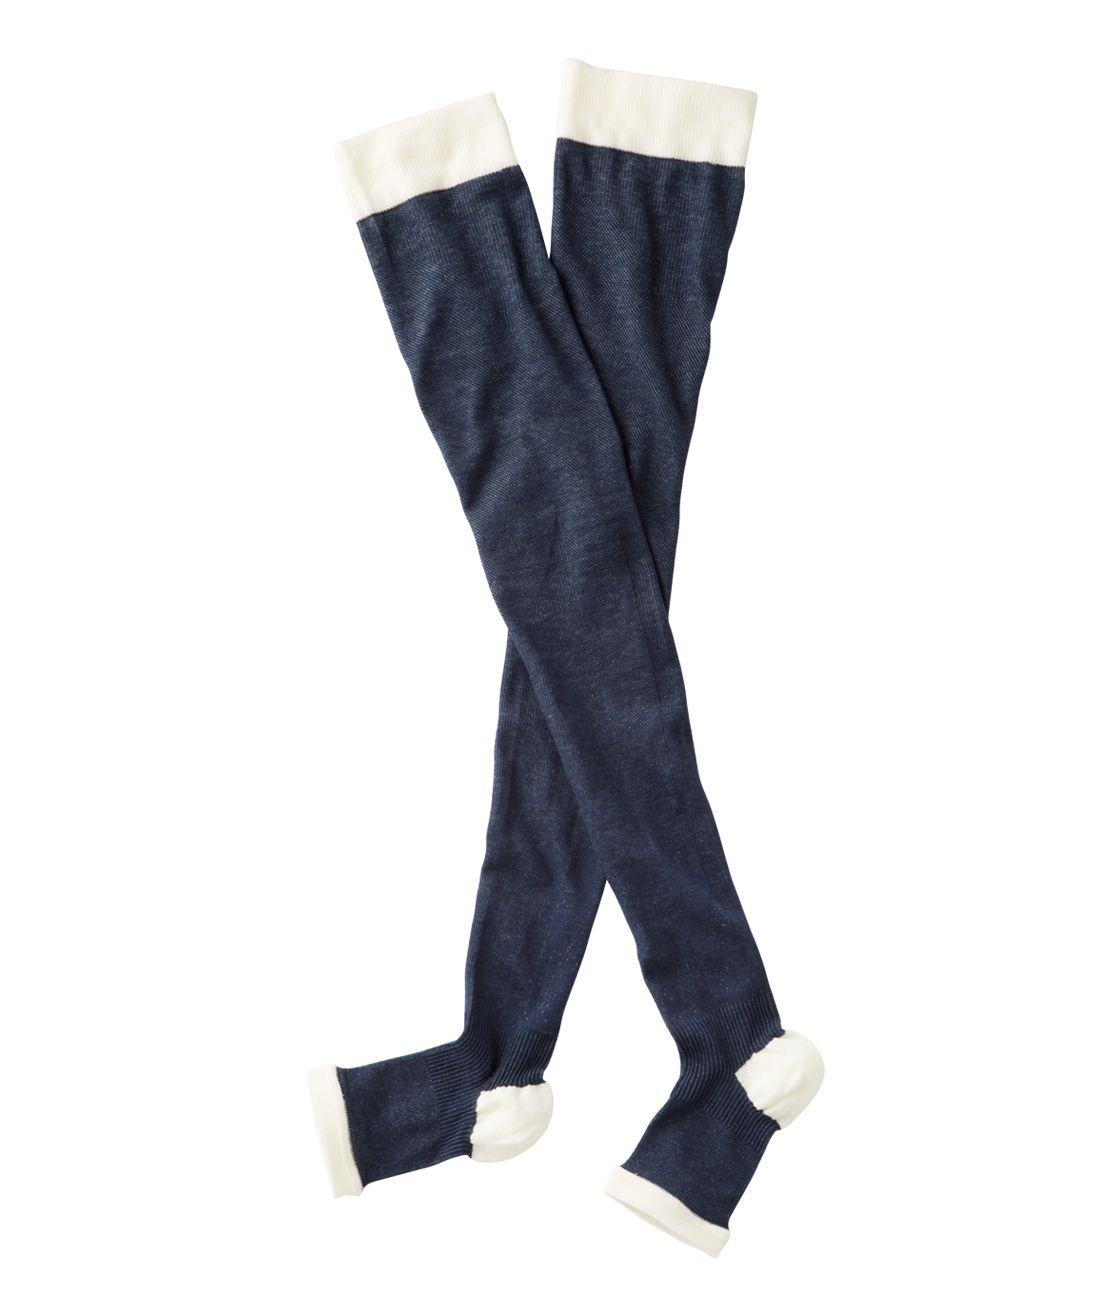 Cotton mixed ringtone pressure over knee socks